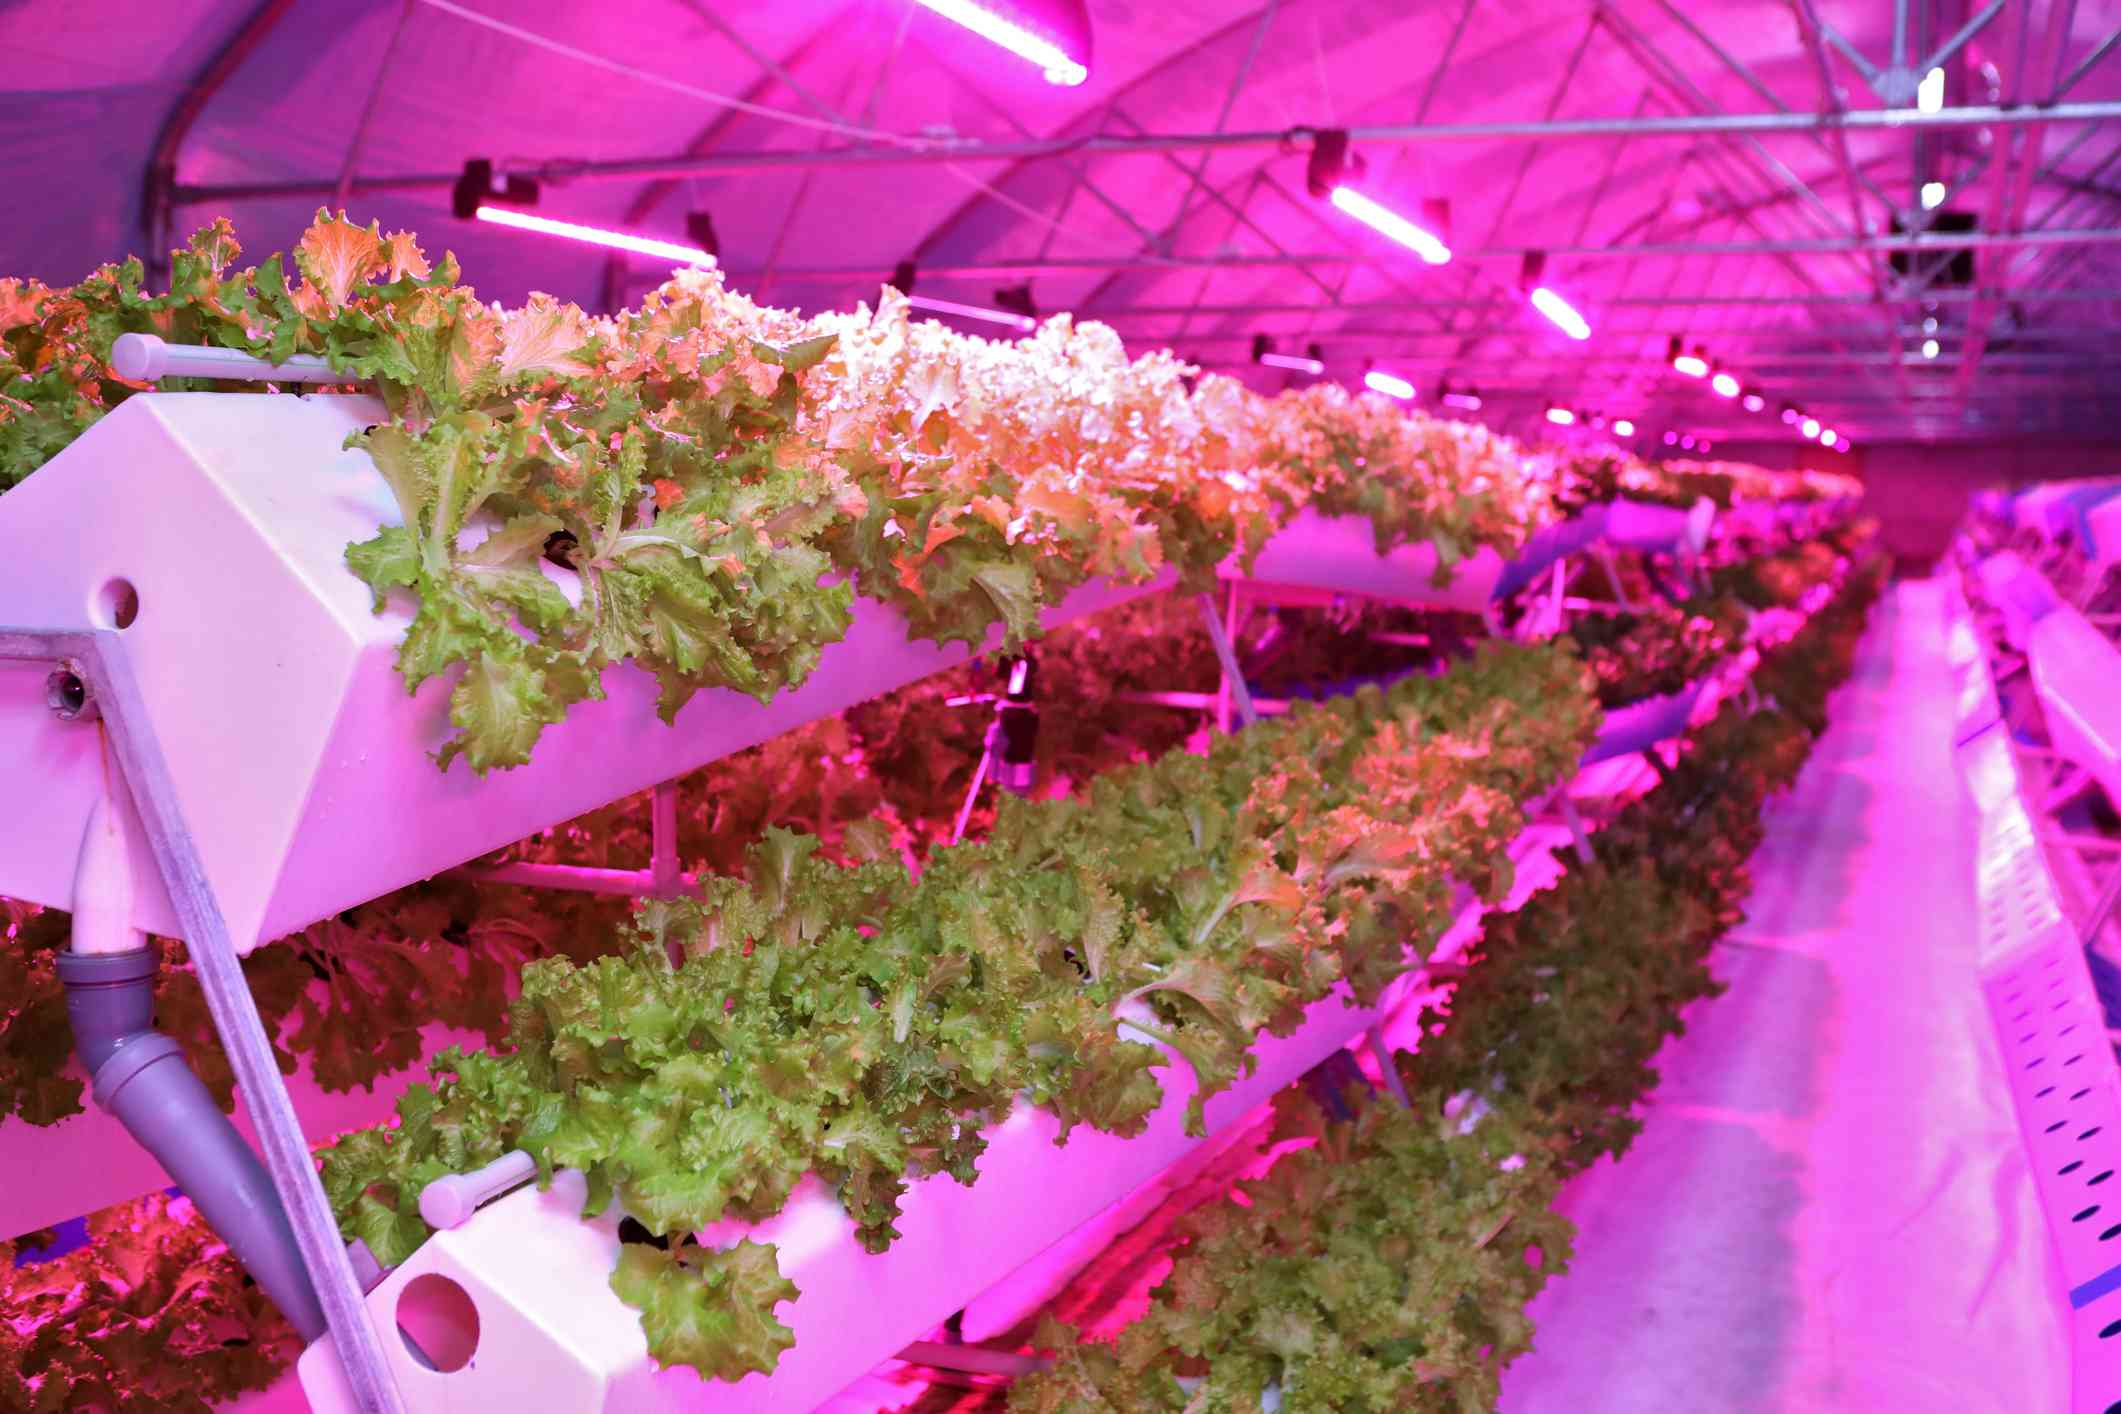 Lettuce growing in an aeroponics greenhouse